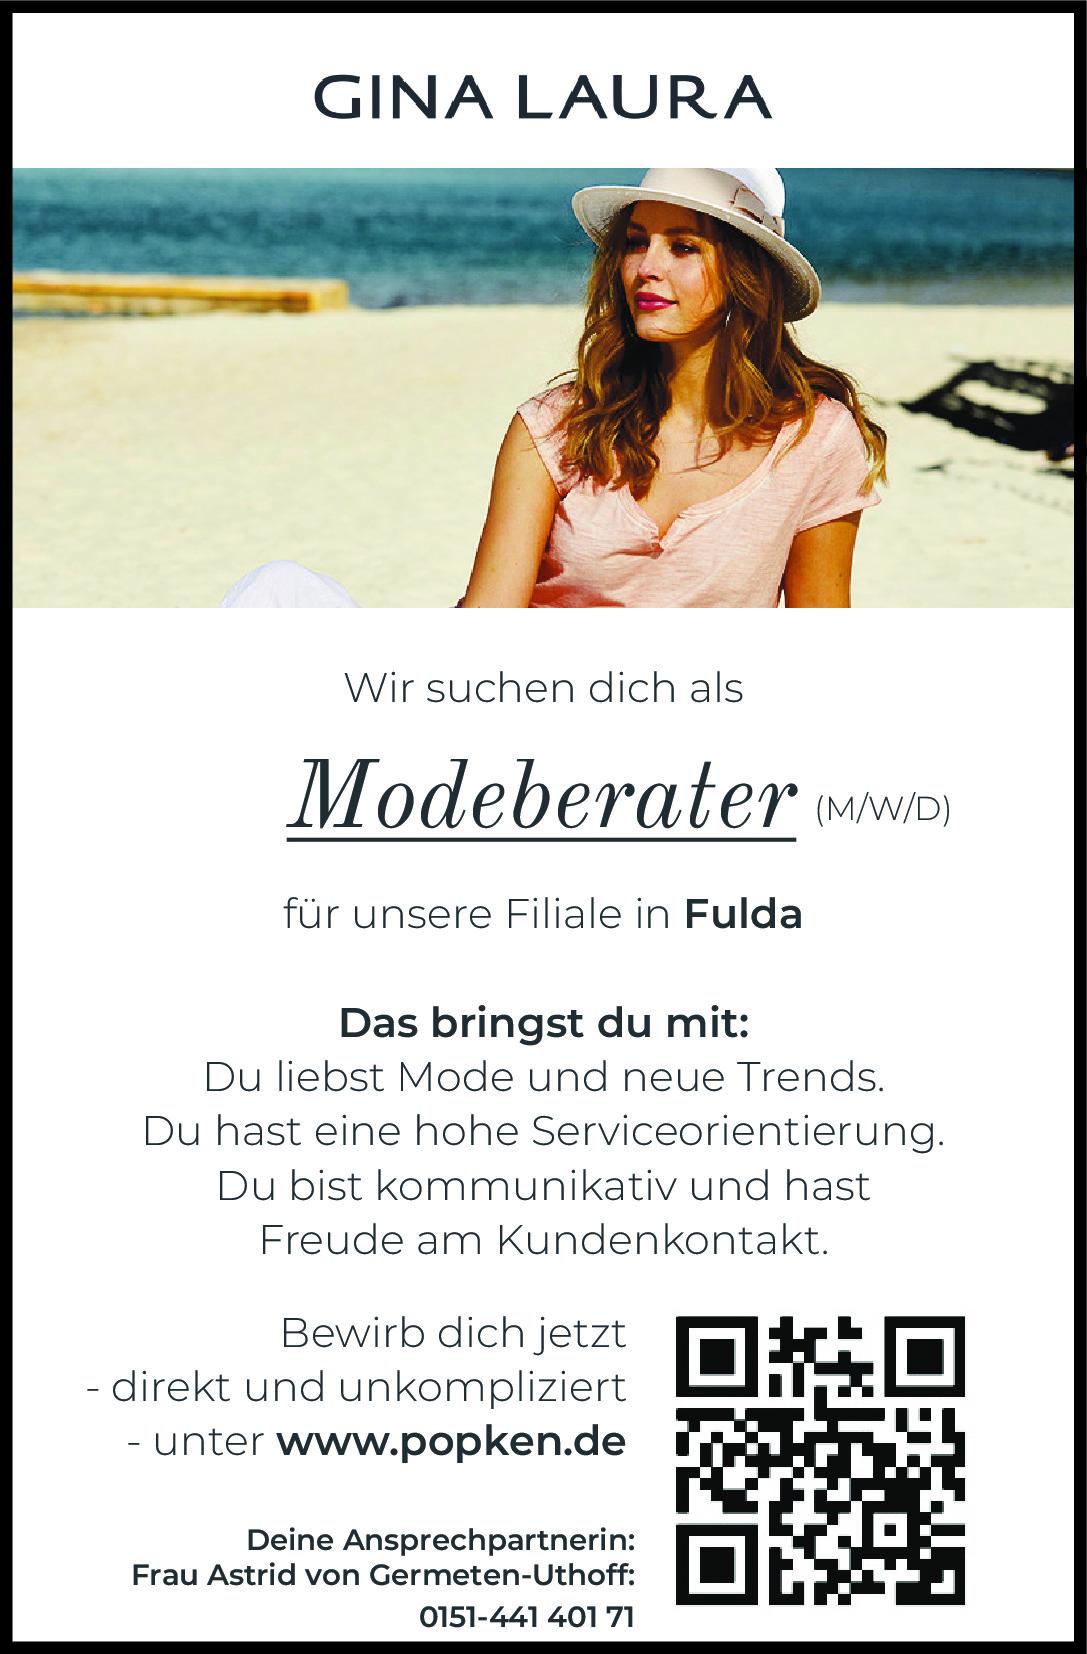 Gina Laura – Modeberater (m/w/d) Fulda